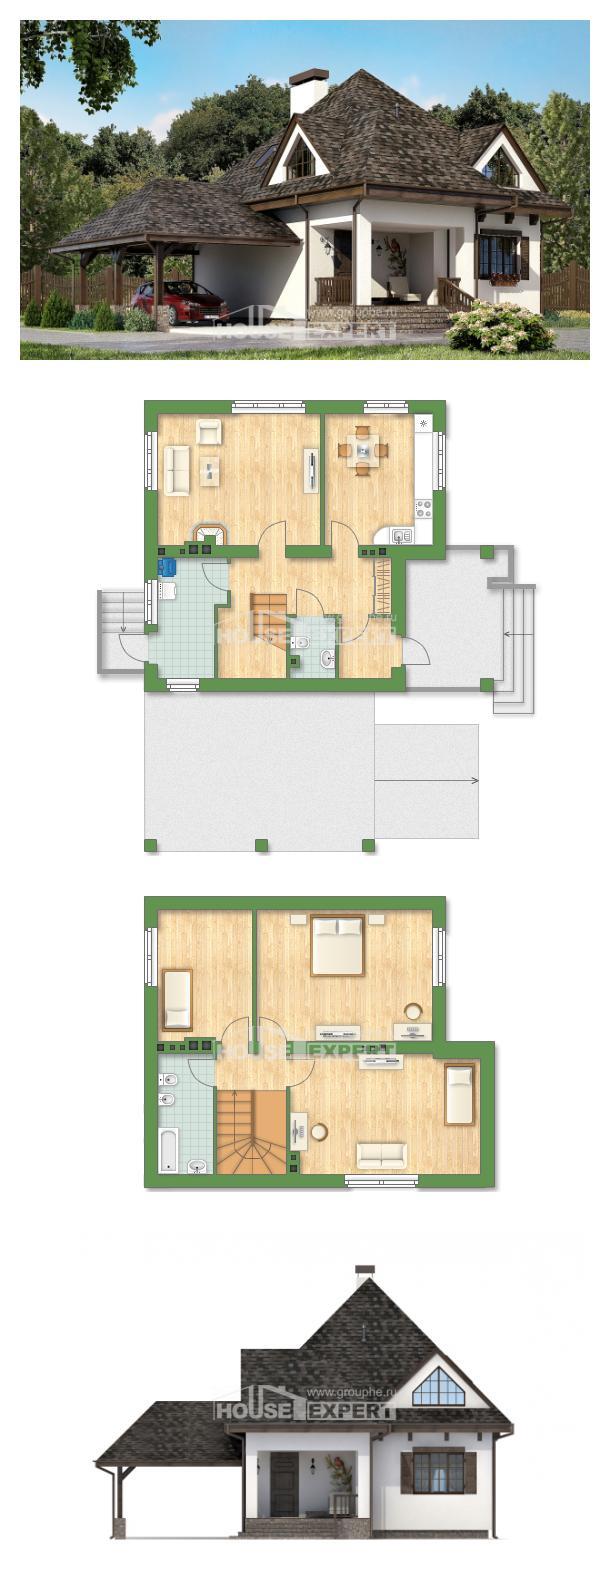 Proyecto de casa 110-002-L | House Expert